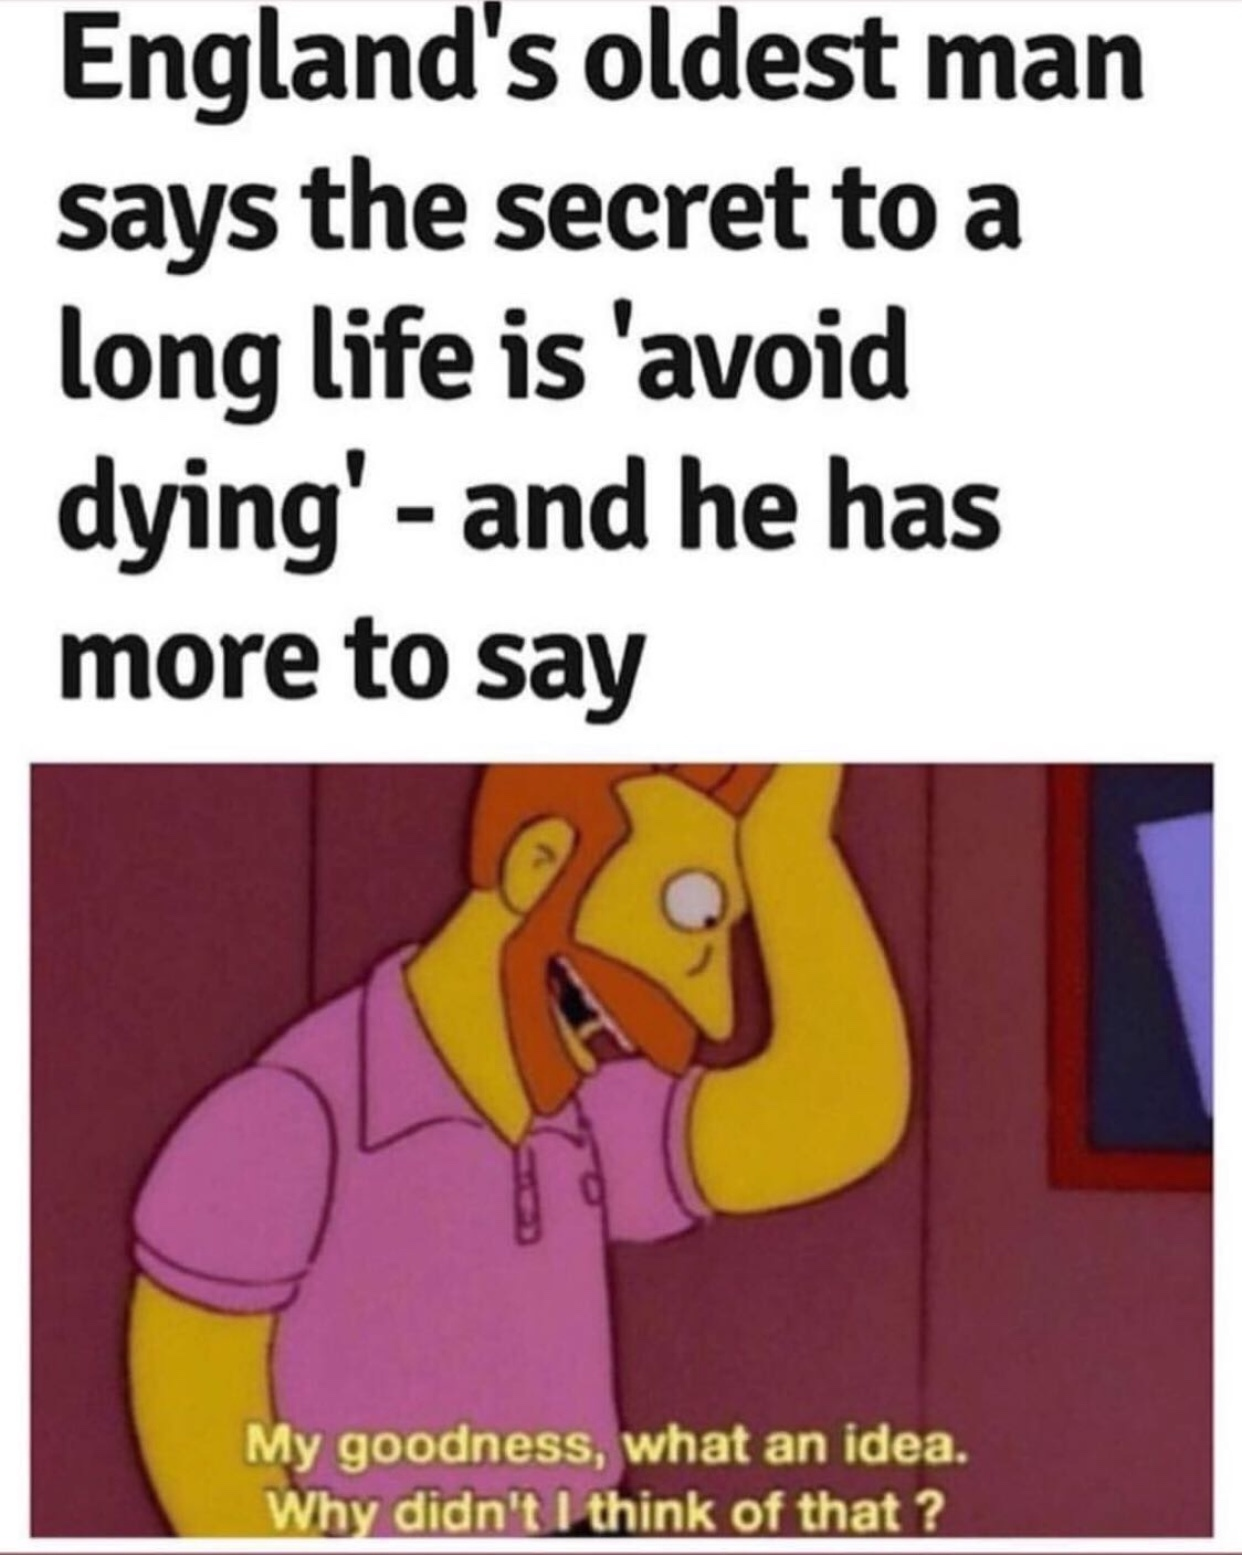 no wonder people can live so long - meme